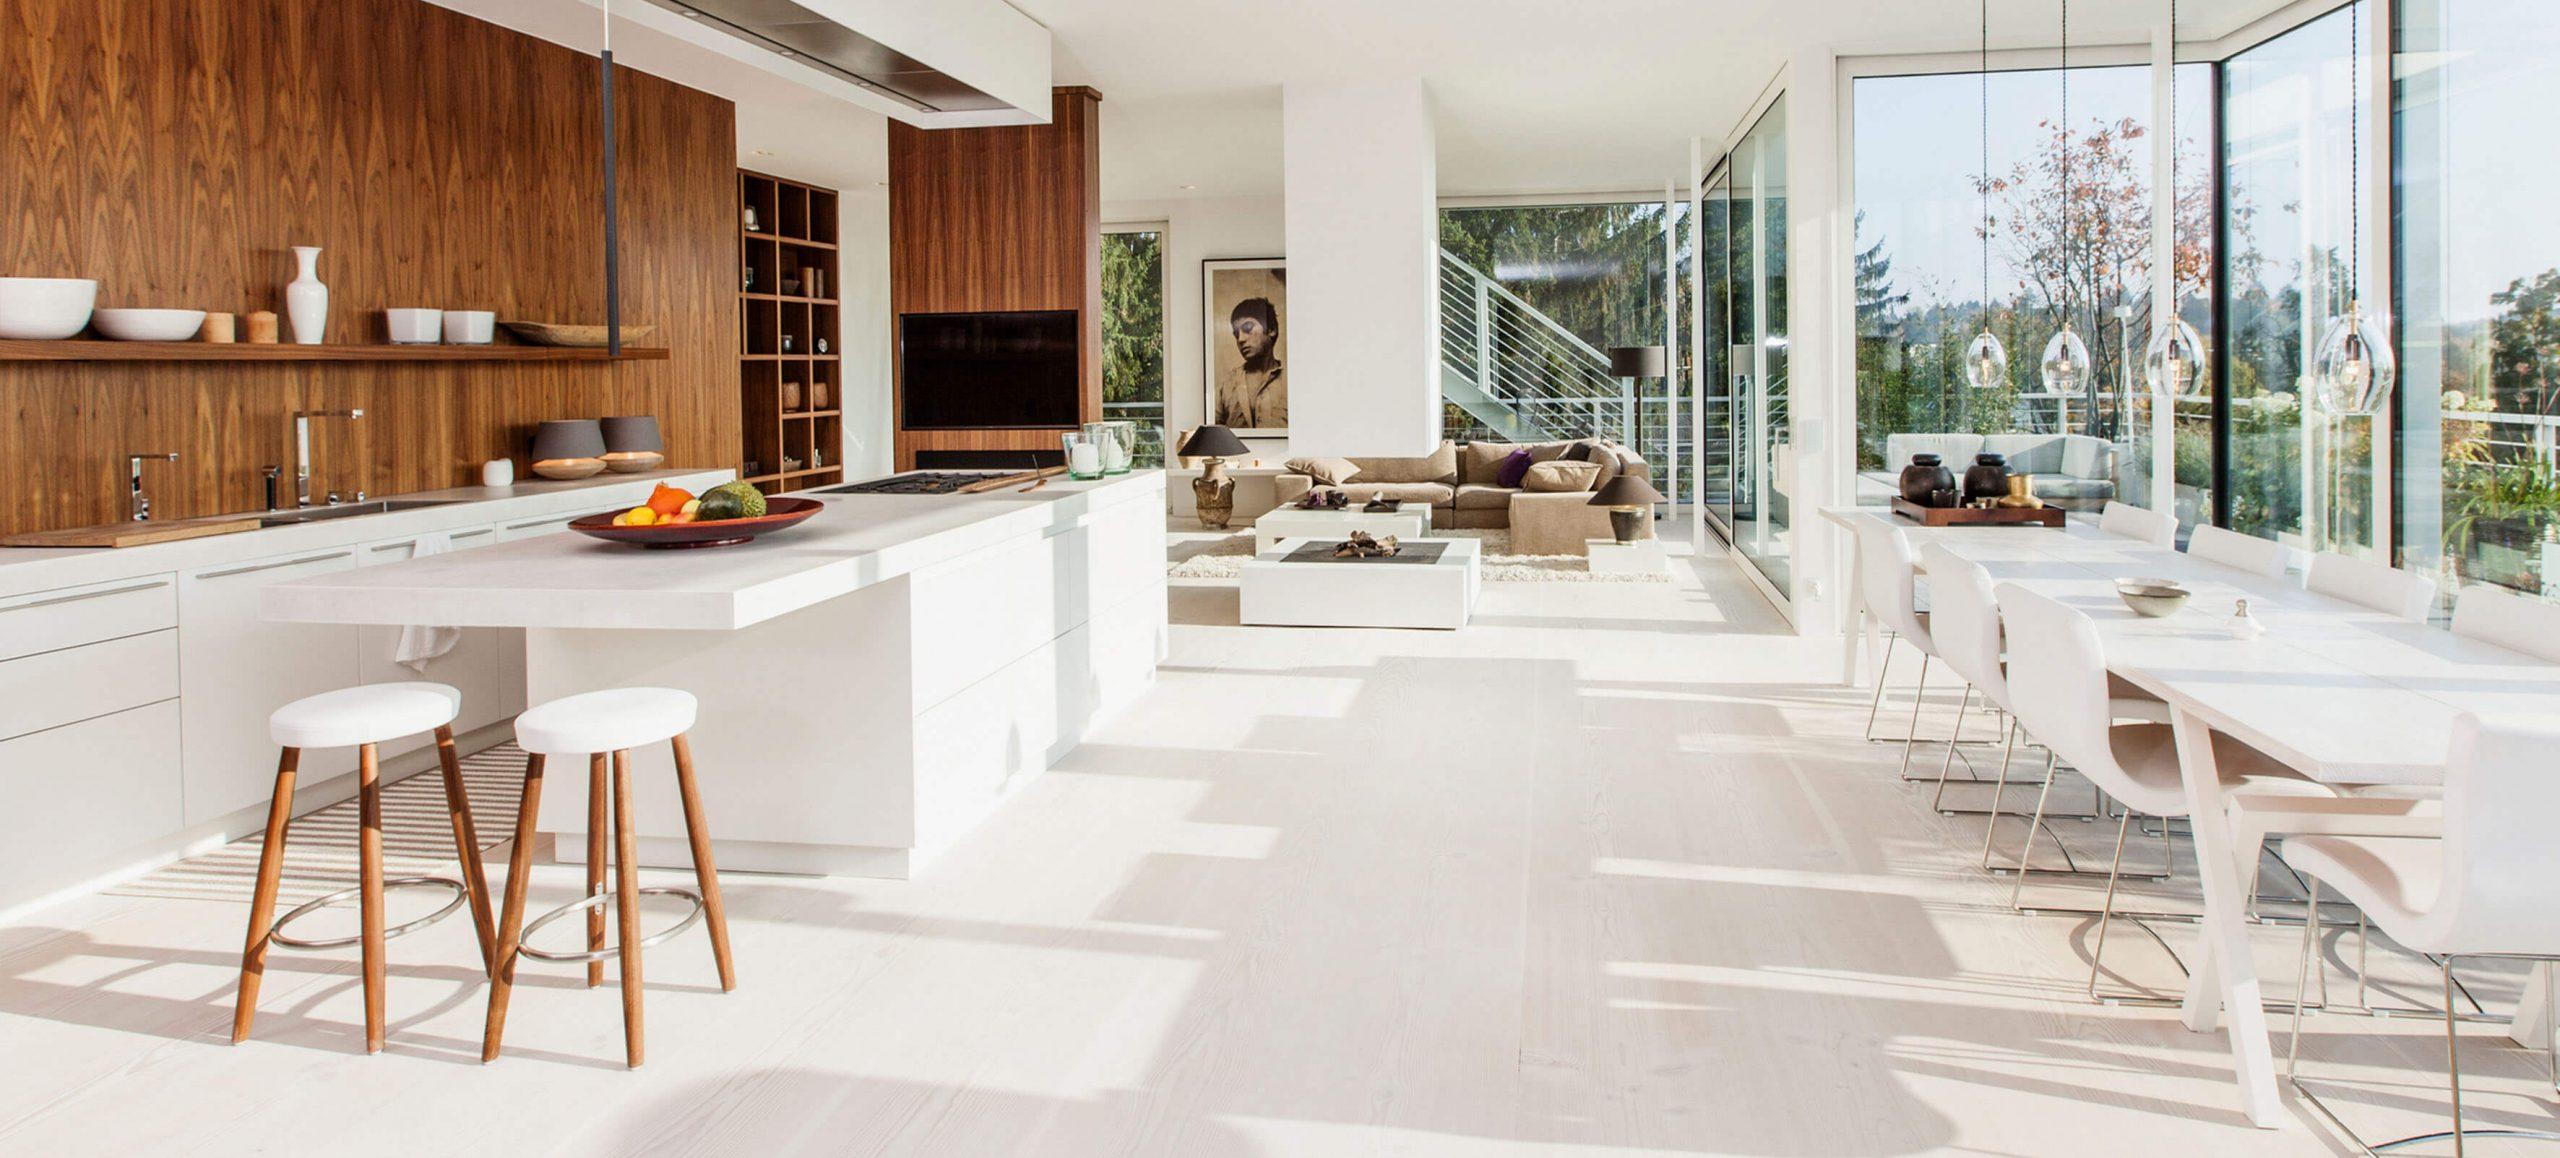 Penthouse im Taunus, Luxus Privatimmobilien in Königstein i.Ts., Kronberg, Bad Homburg by Eberhard Horn Real Estate